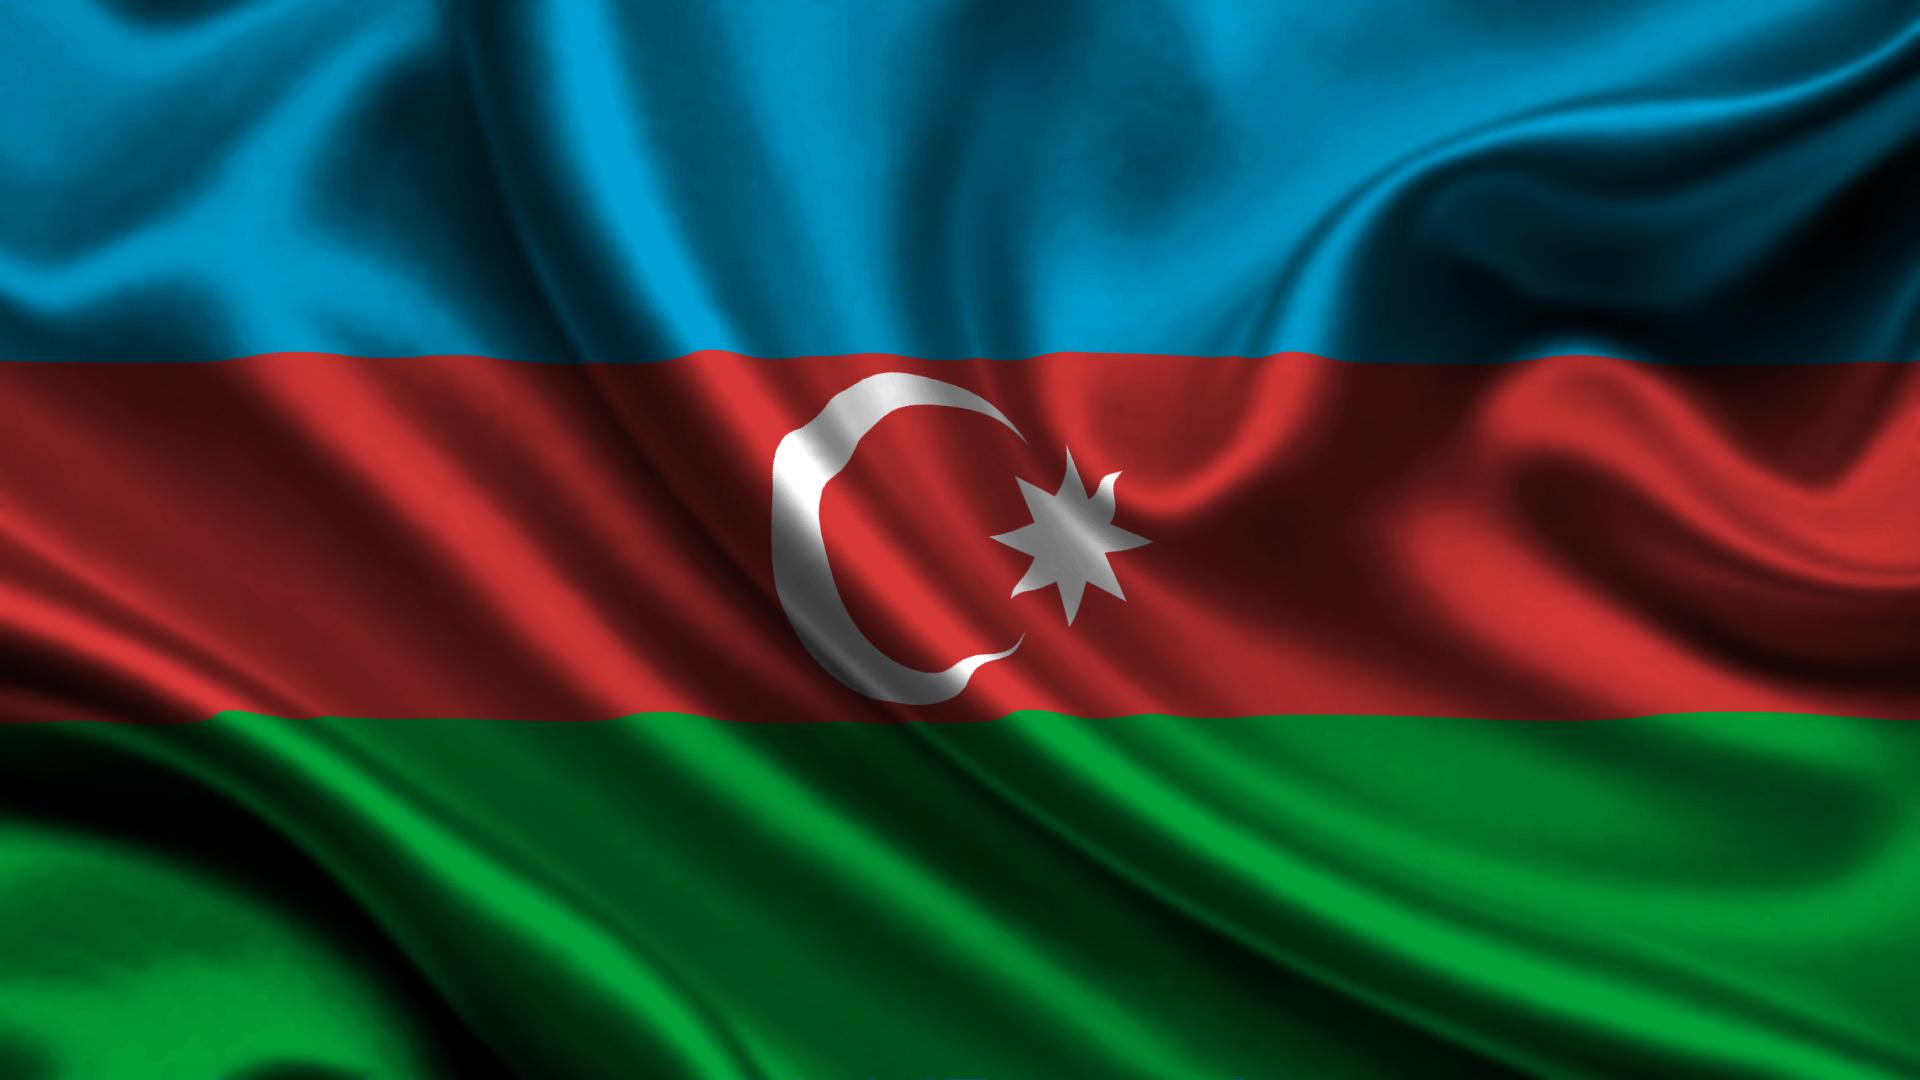 flag of Azerbaijan HD Wallpaper Background Image 1920x1080 1920x1080